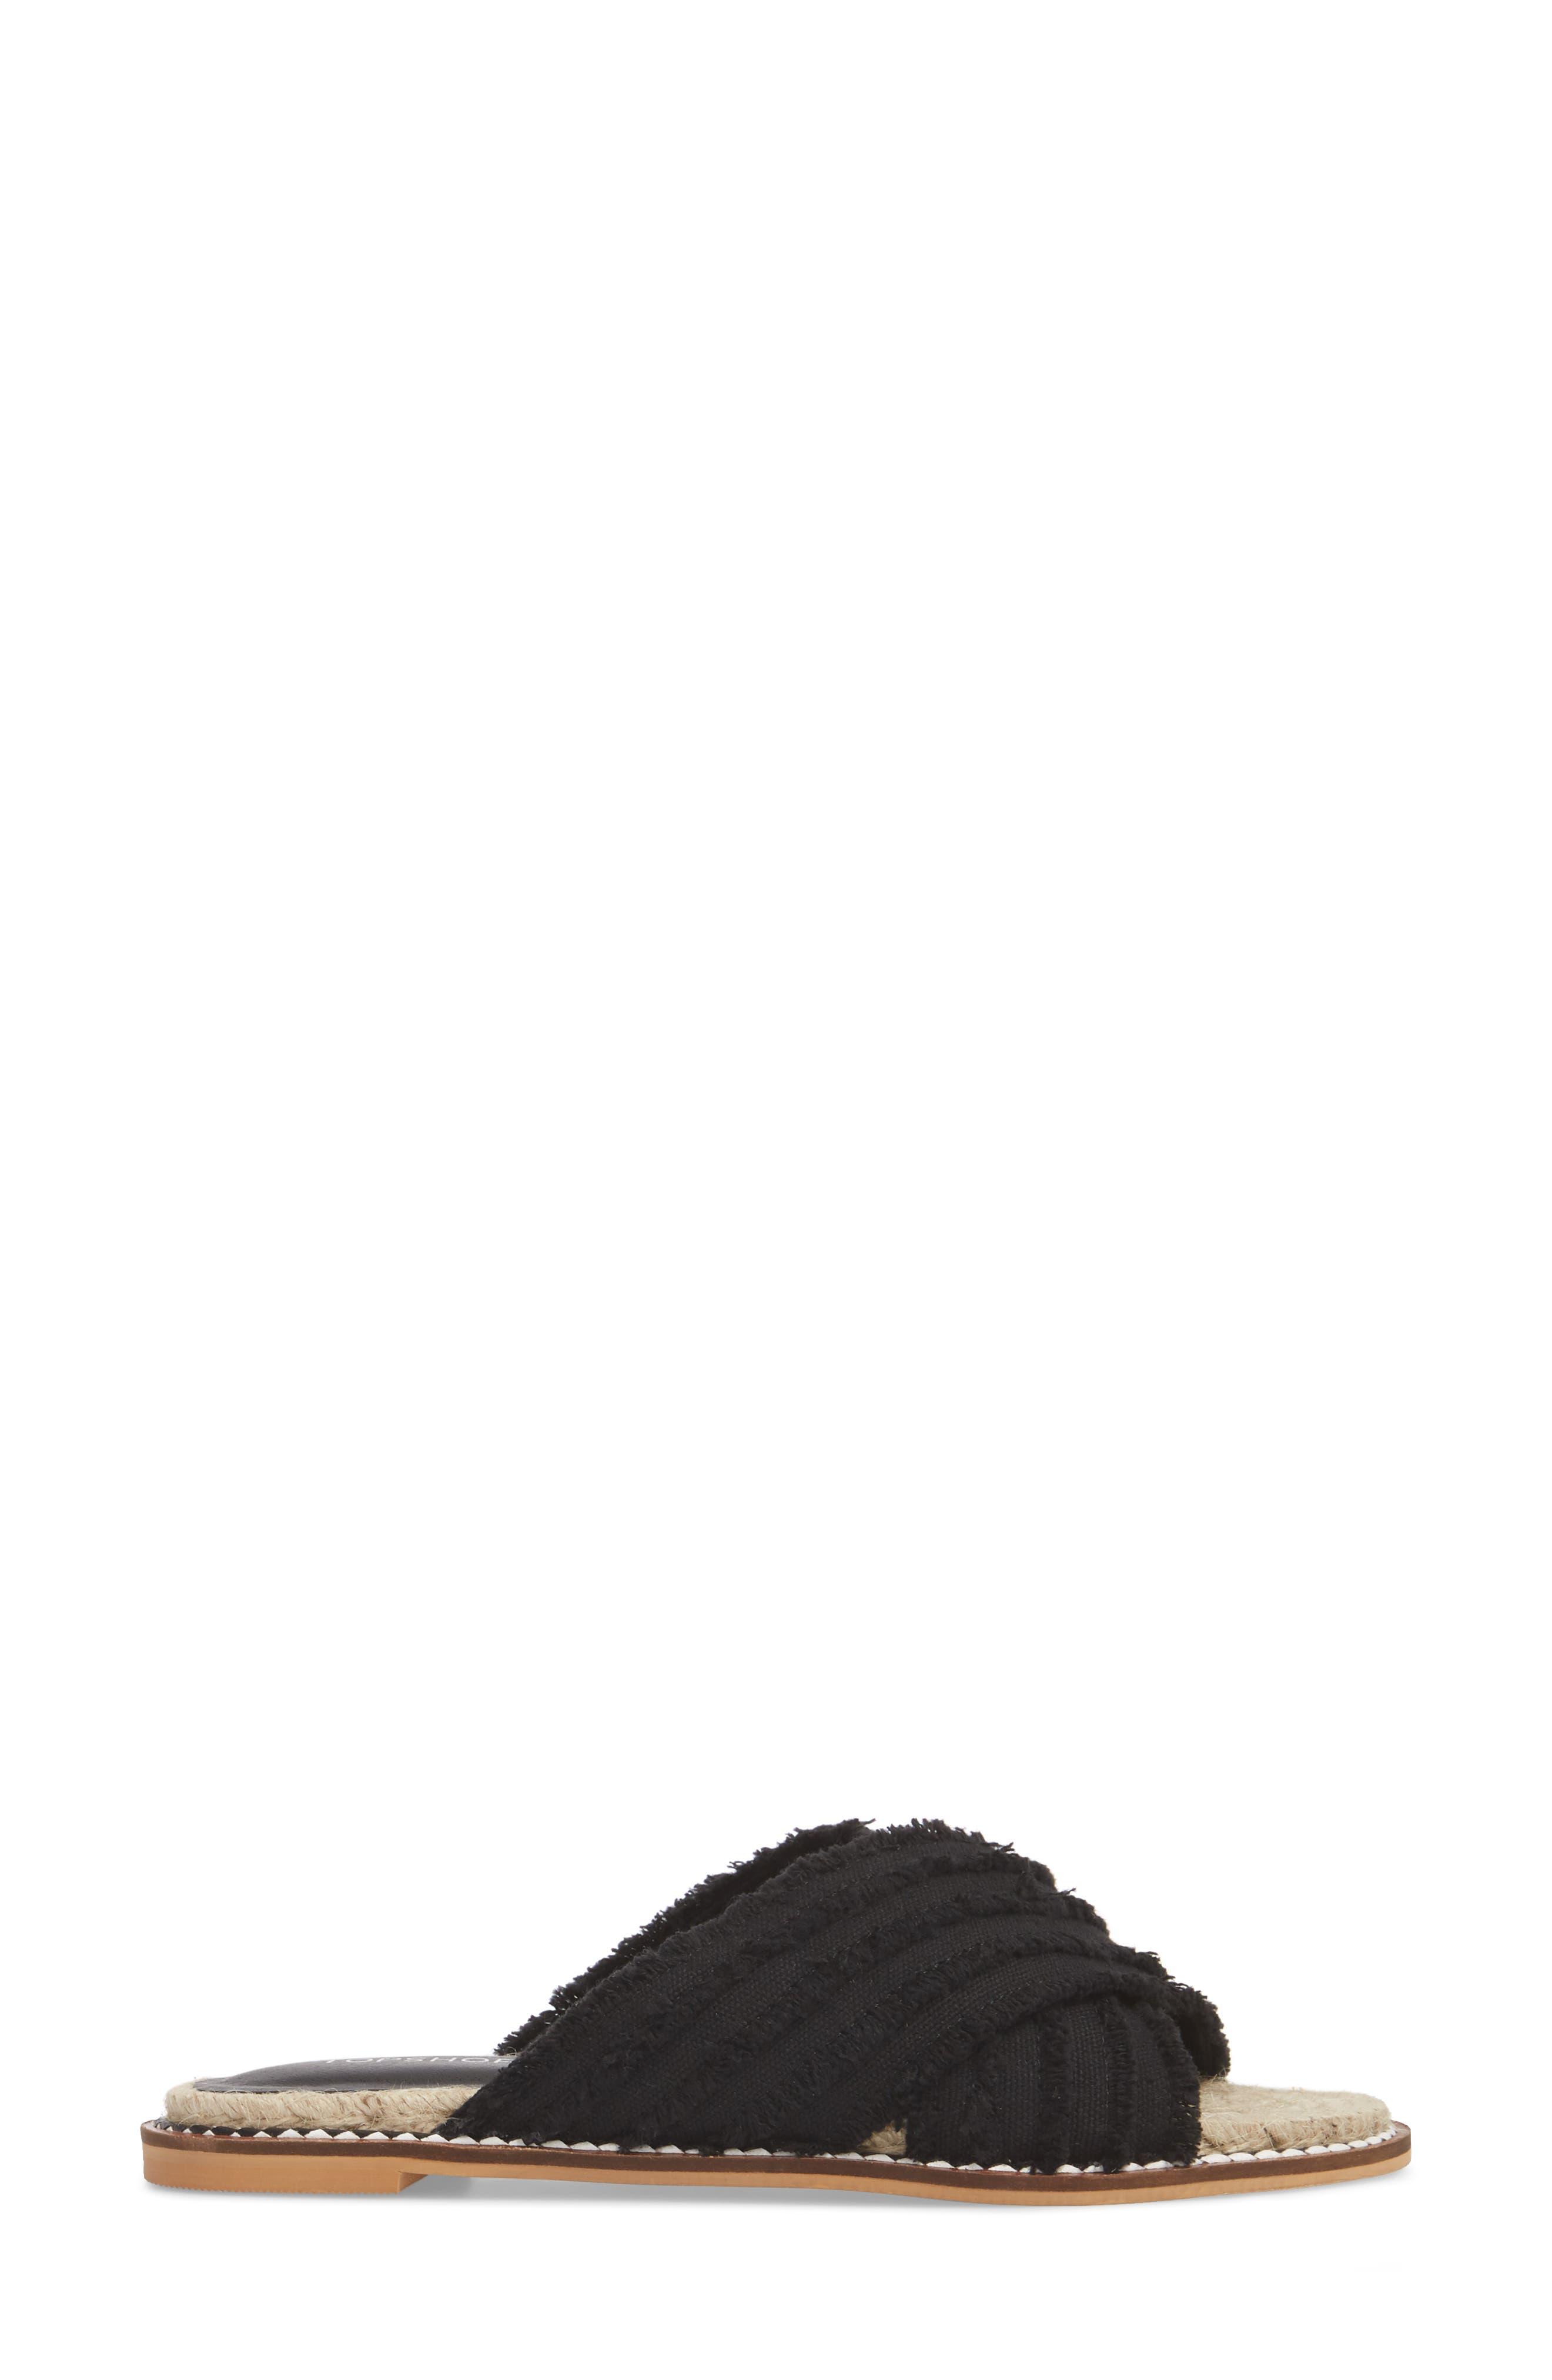 Hibiscus Slide Sandal,                             Alternate thumbnail 3, color,                             001